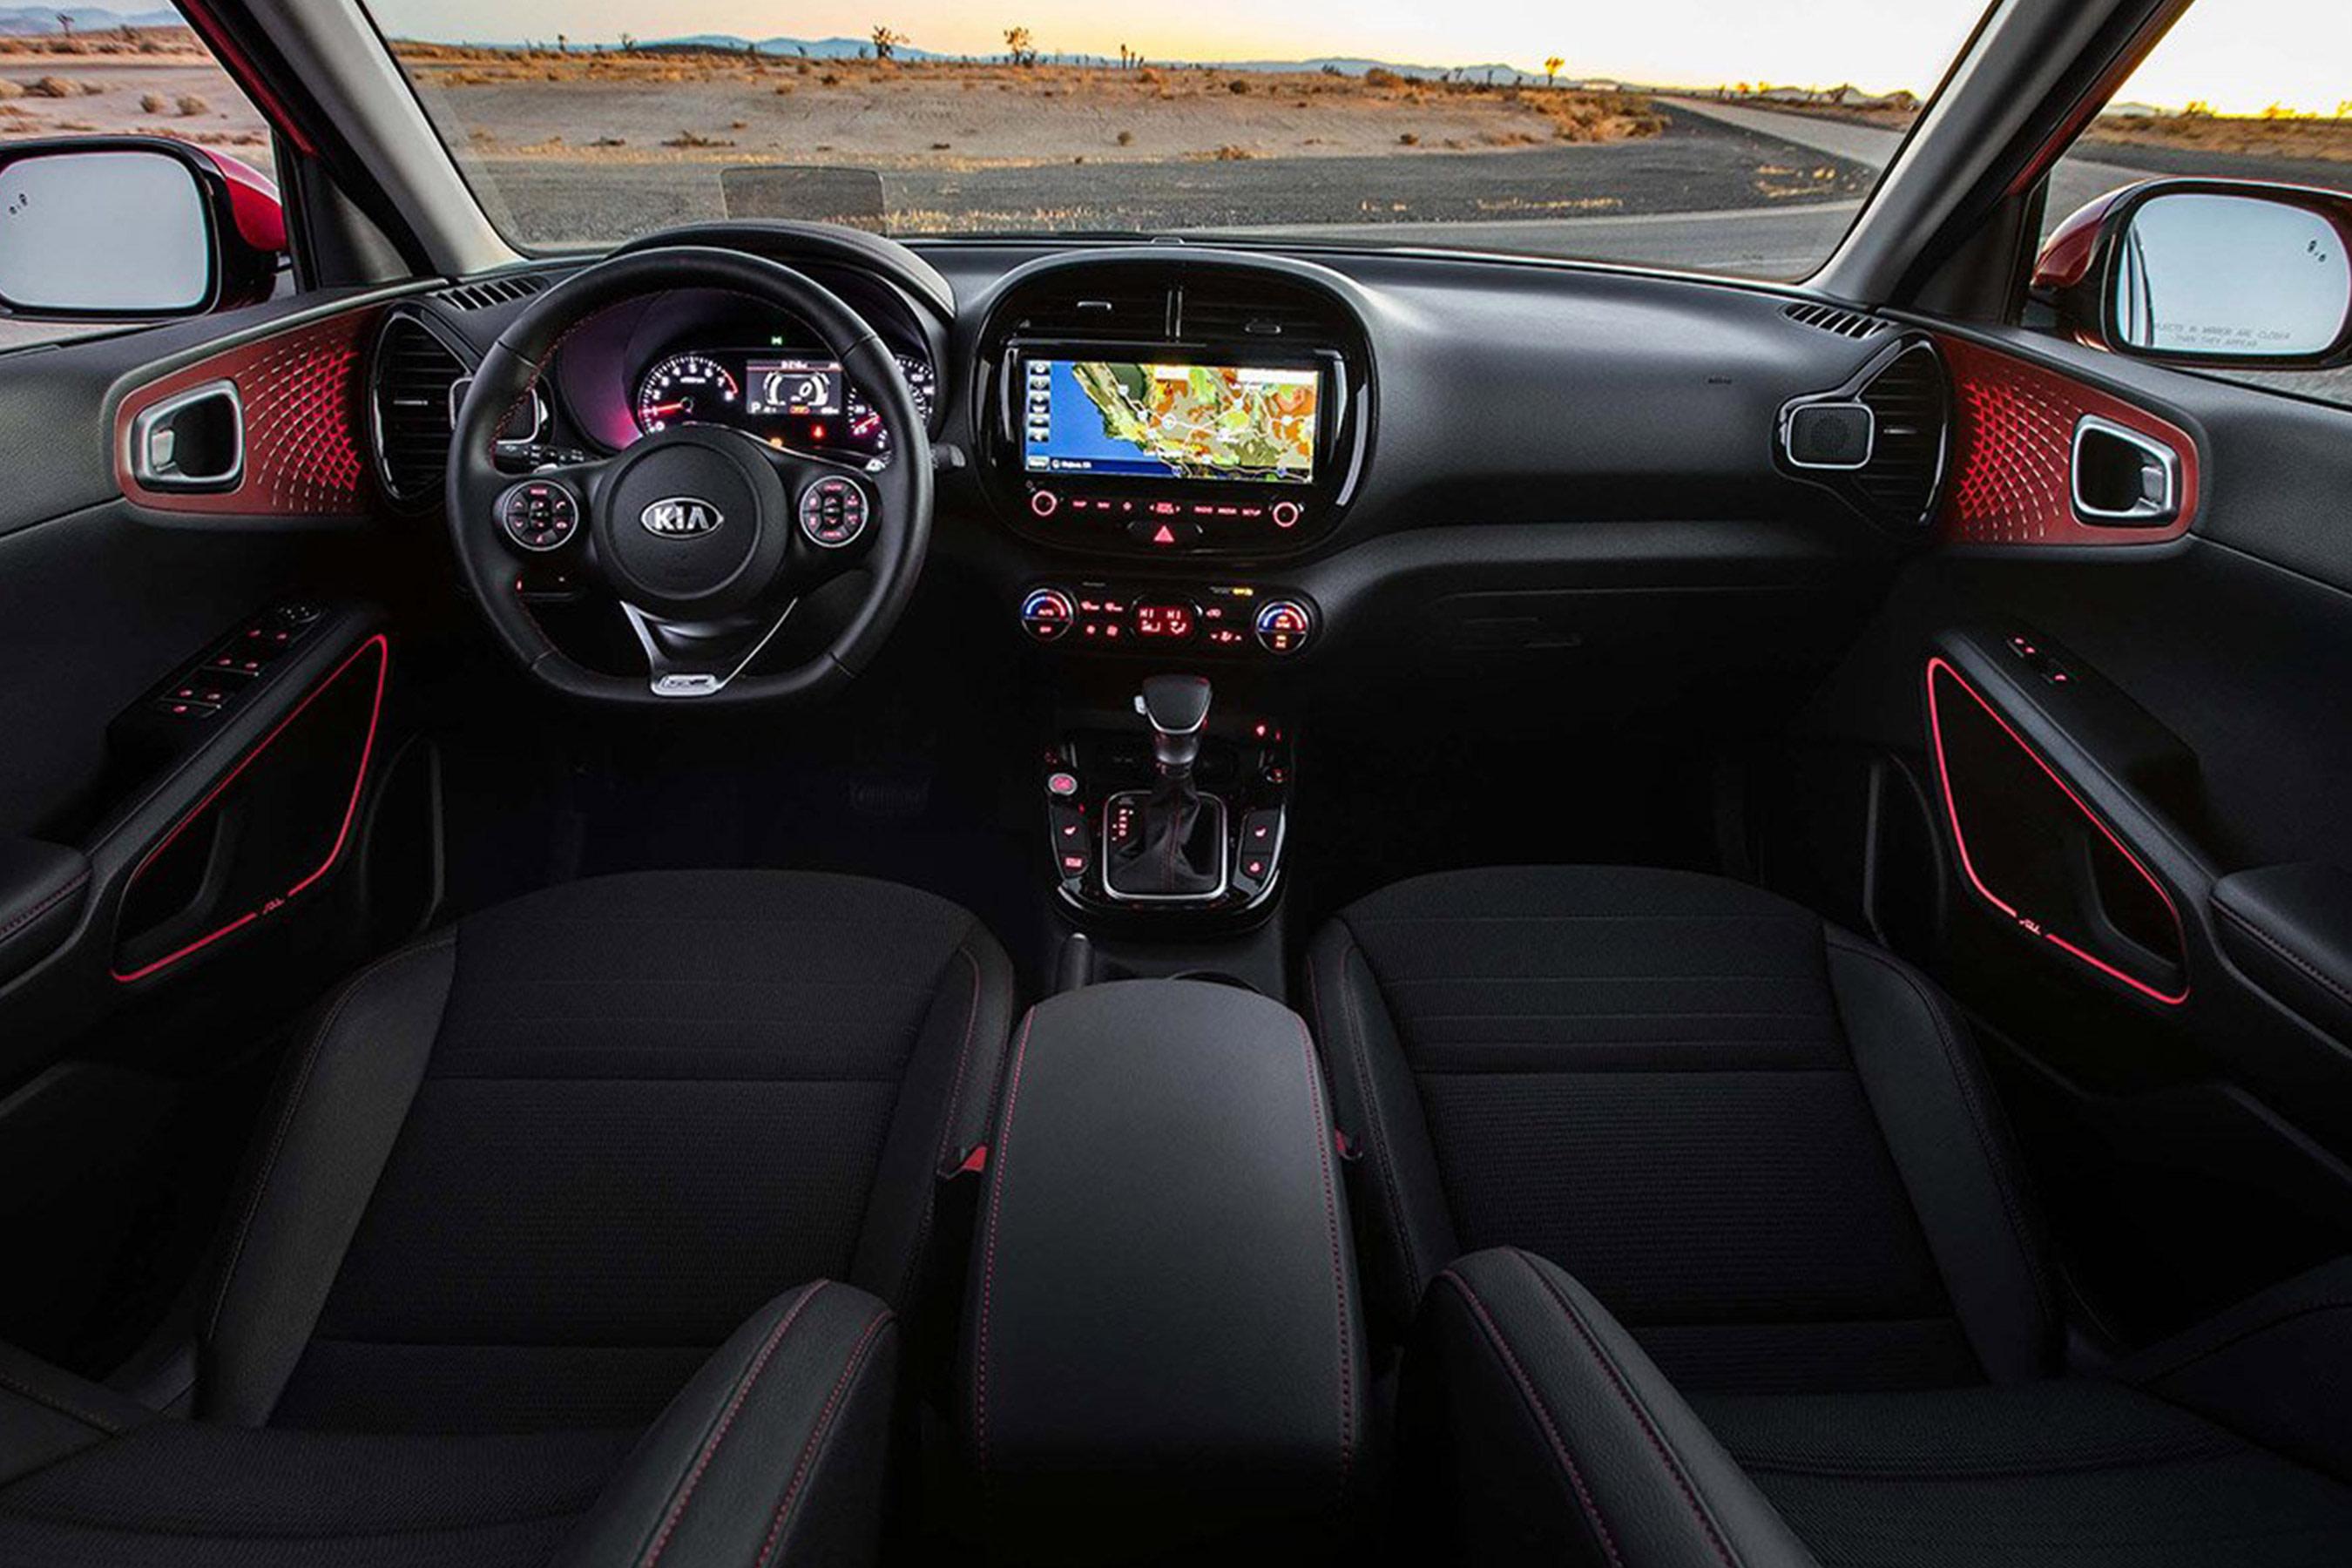 Interior of the 2020 Kia Soul